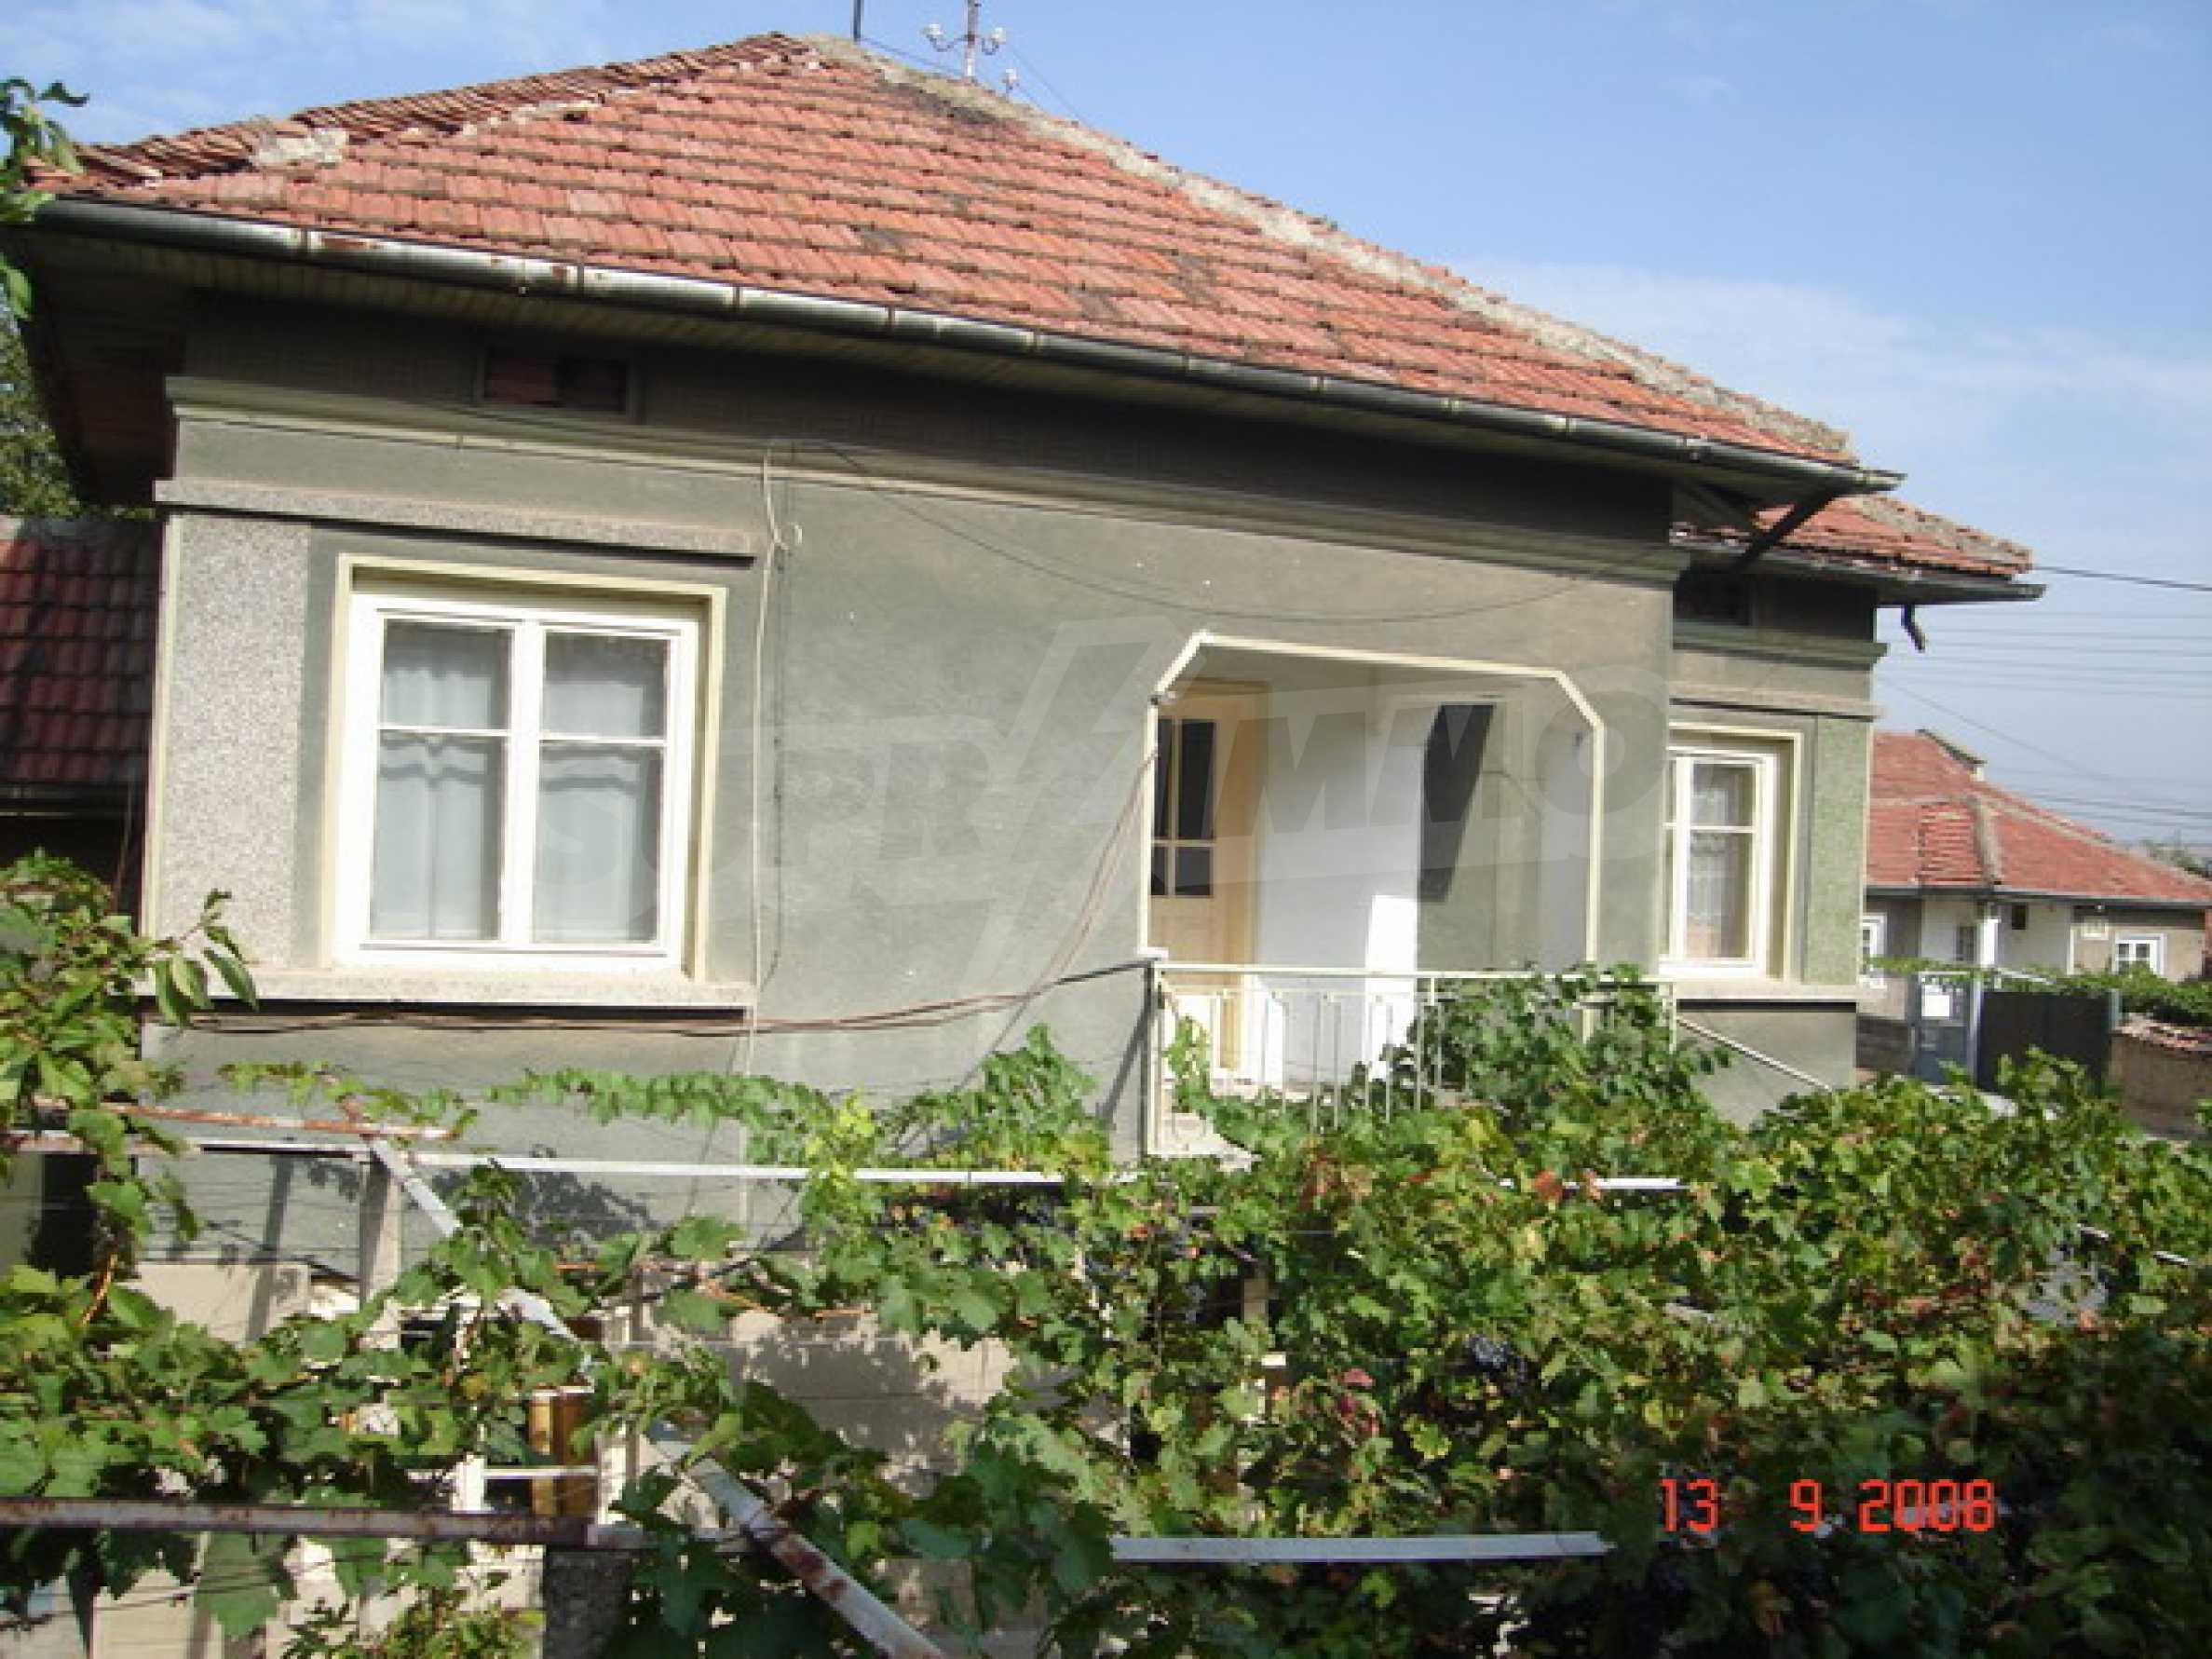 House near the Danube river 2